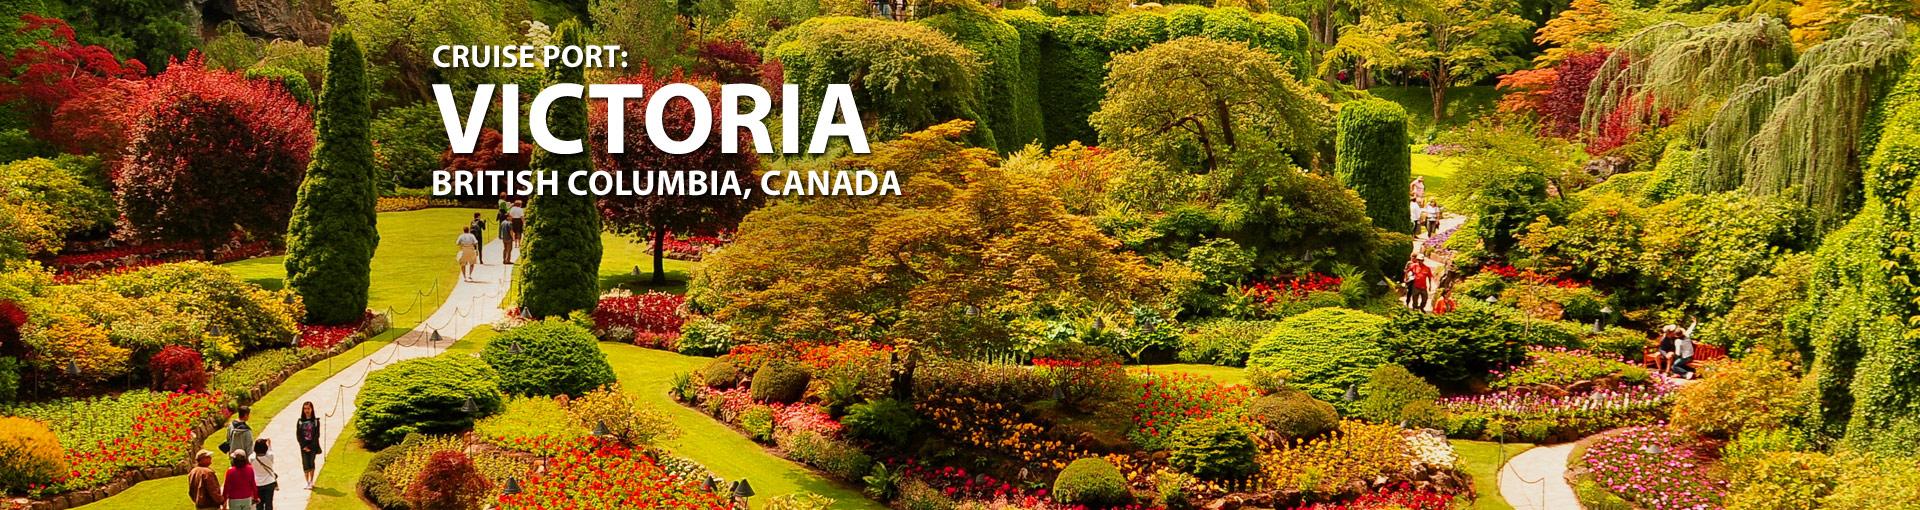 Cruises from Victoria, British Columbia